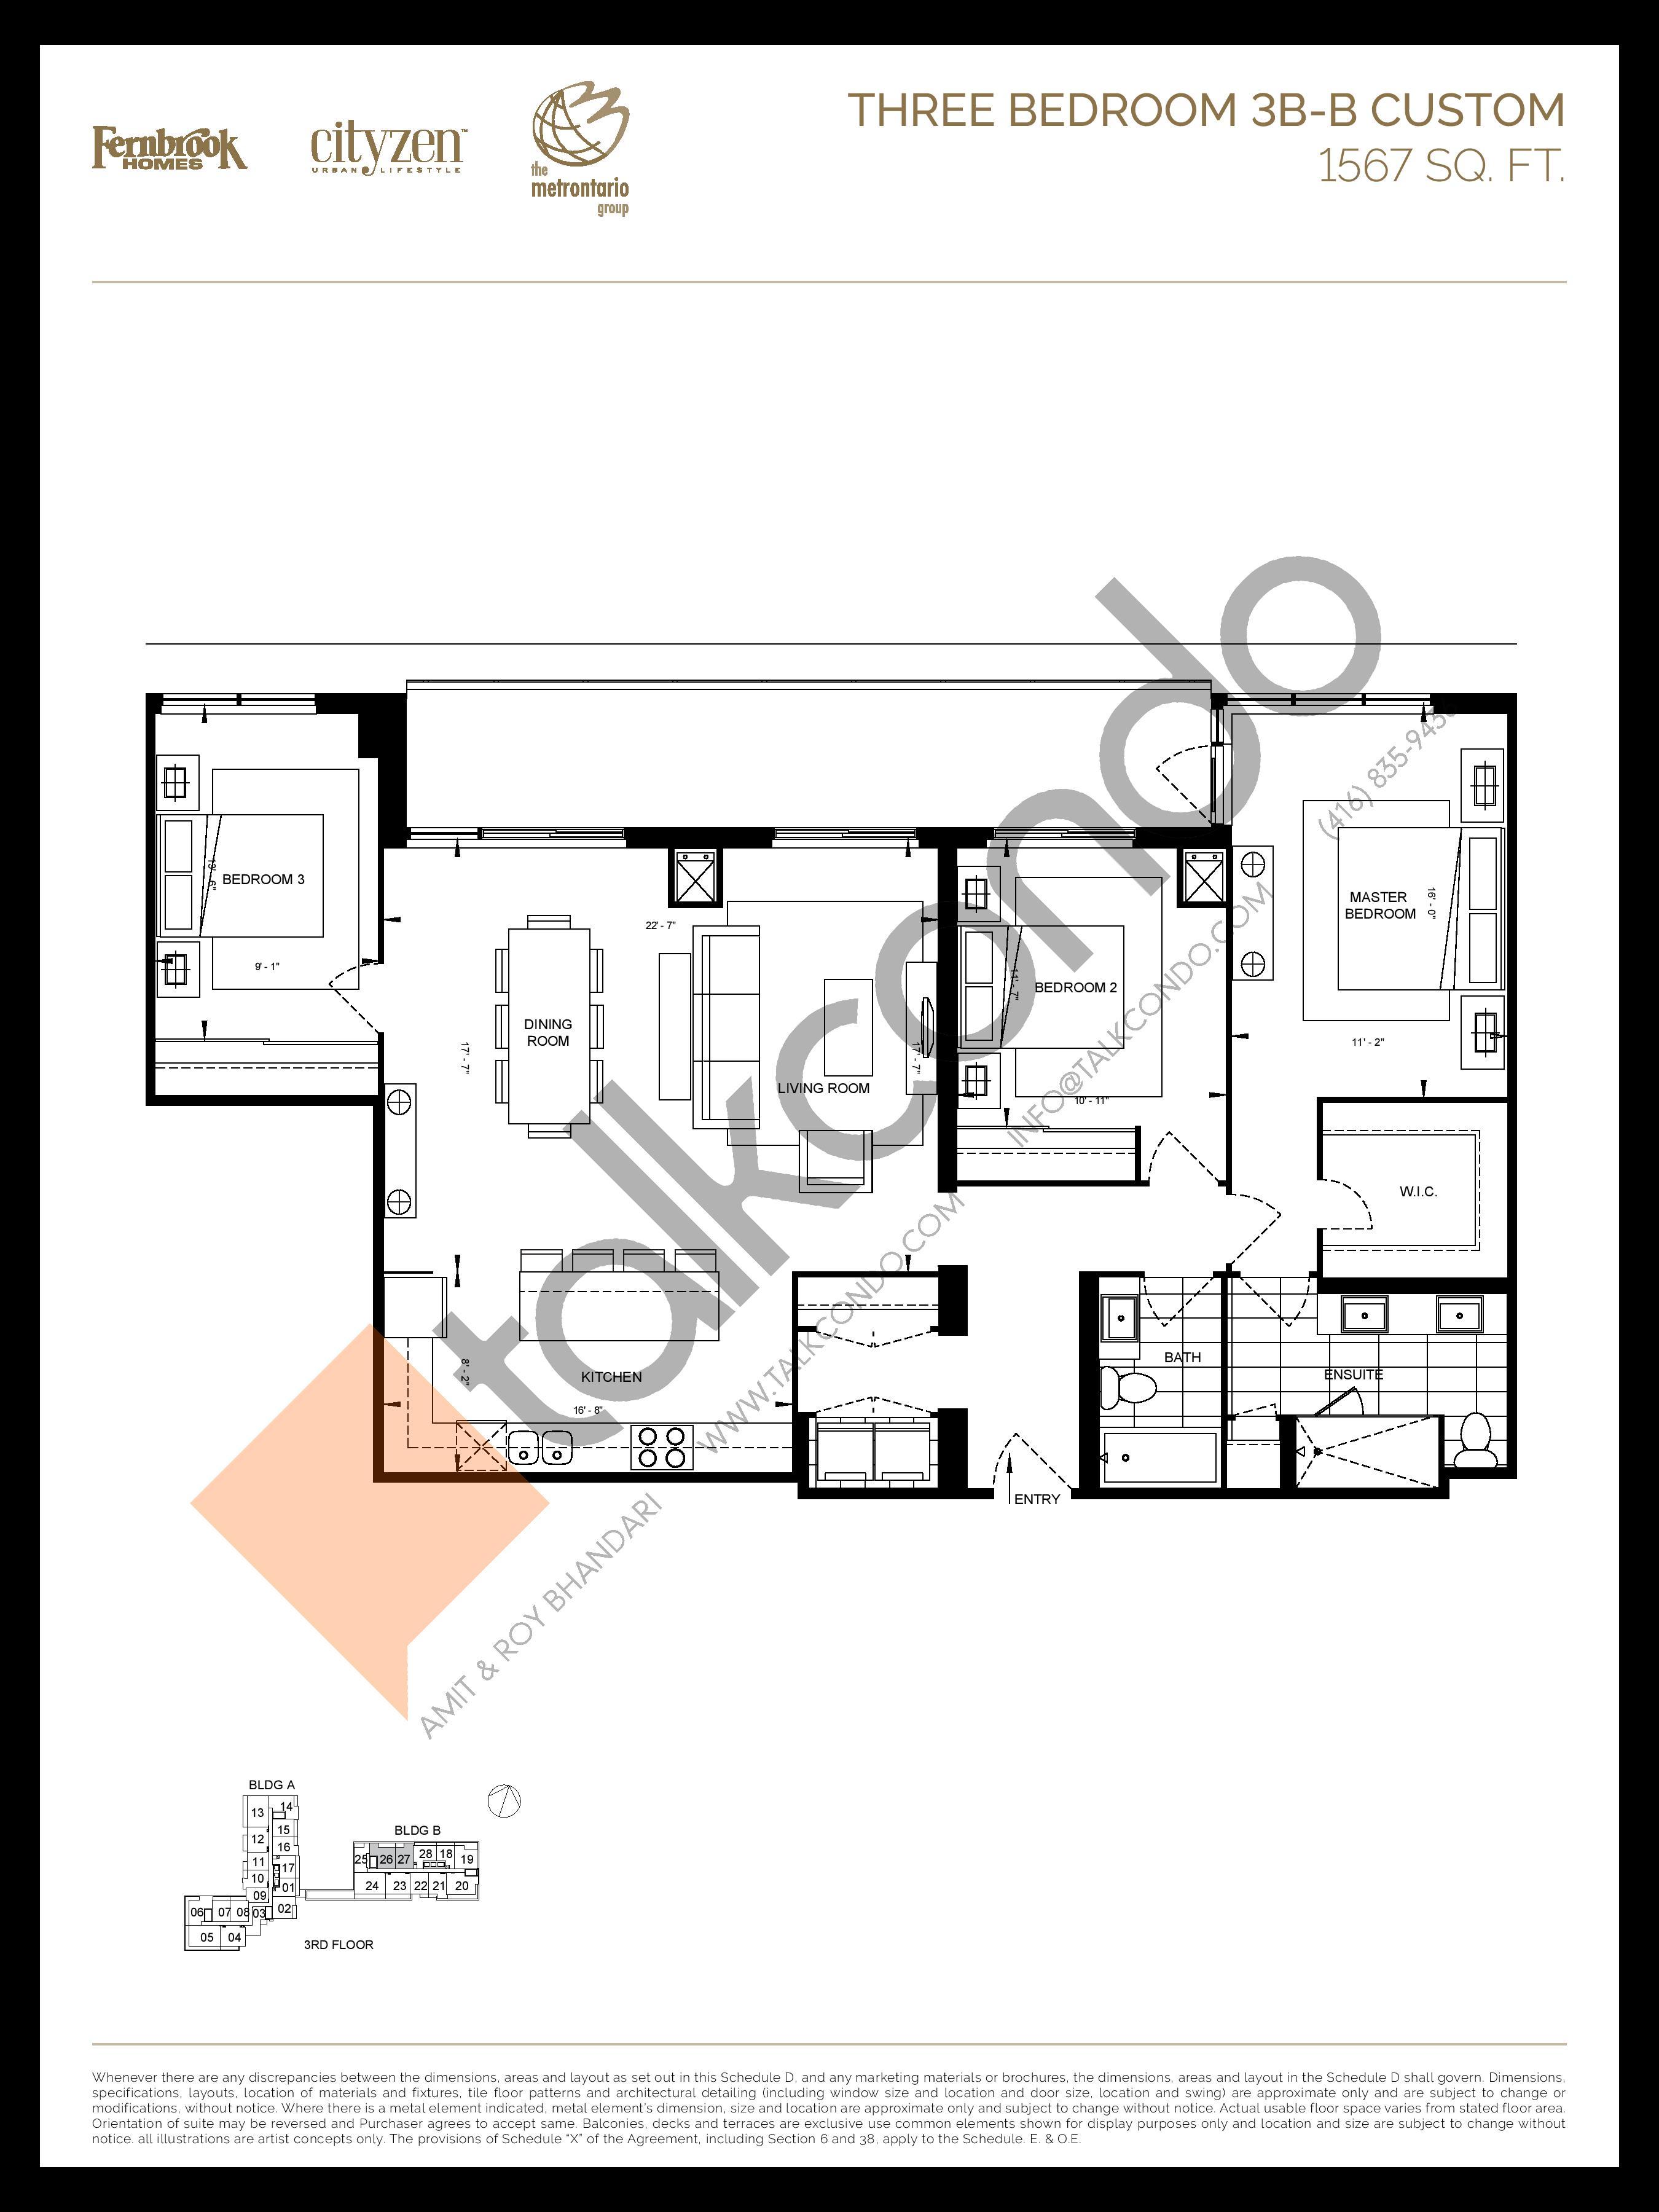 3B-B CUSTOM Floor Plan at D'or Condos - 1567 sq.ft